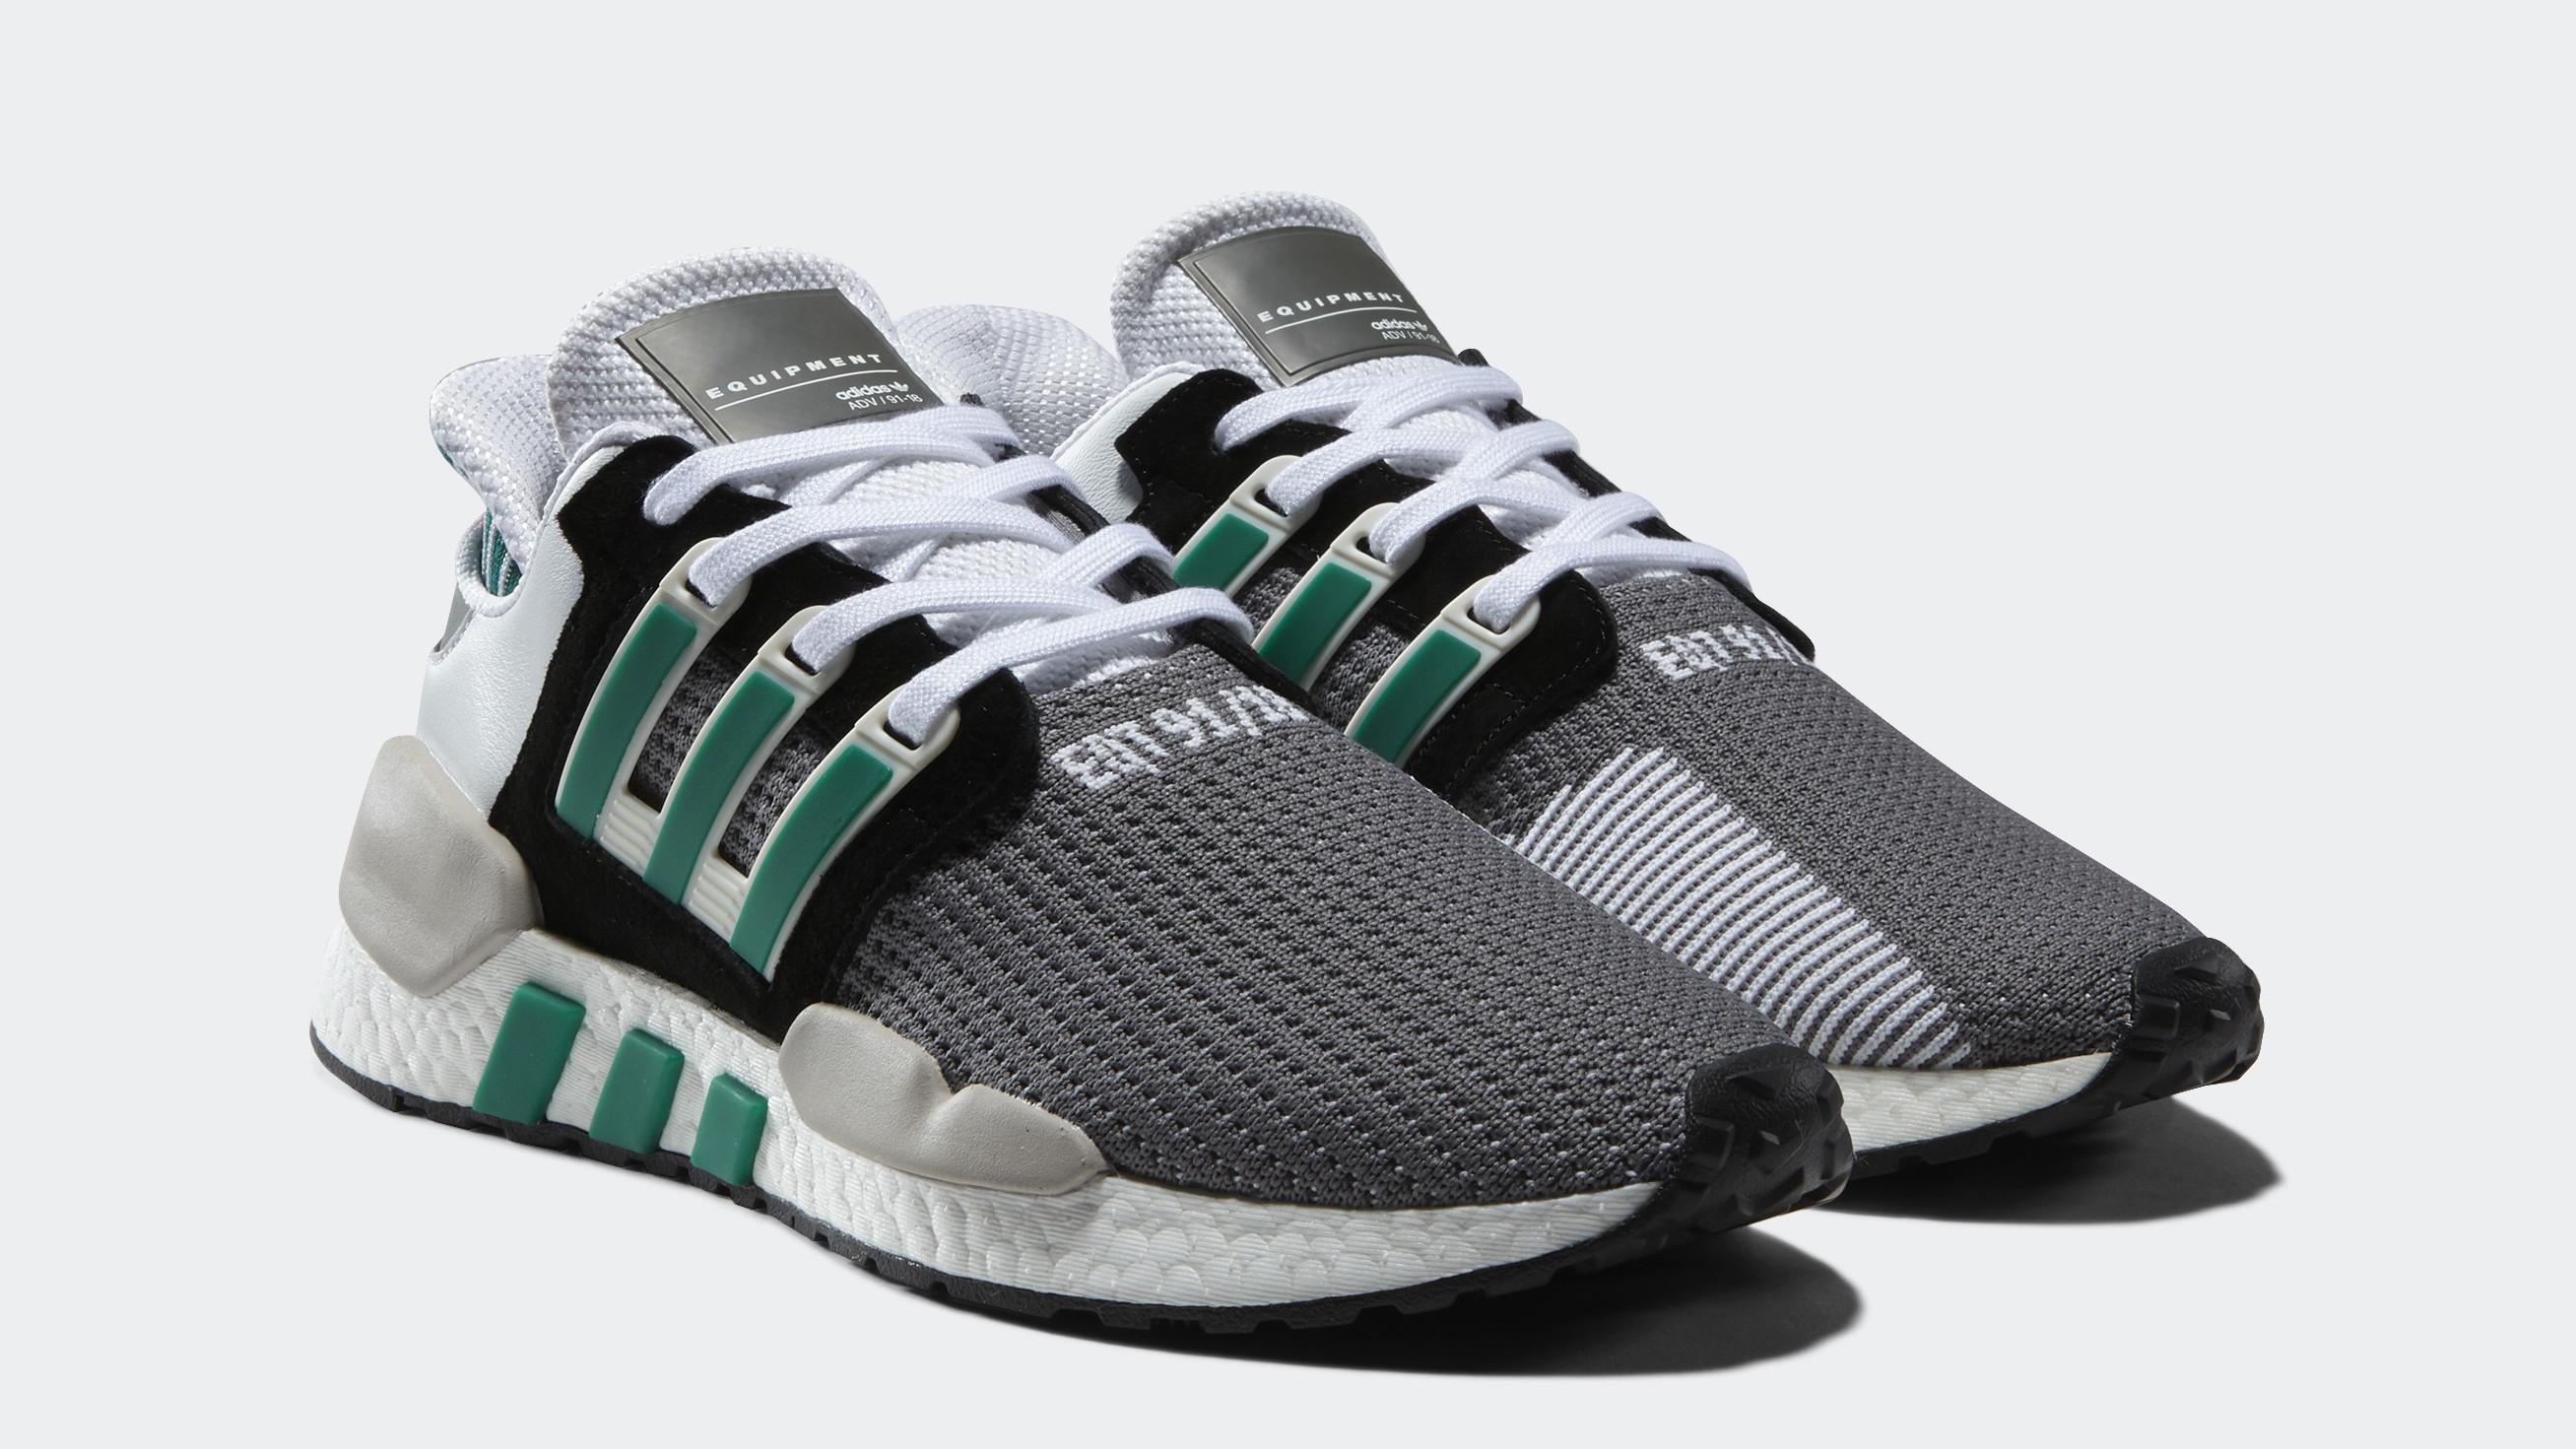 ... Adidas Introduces a New EQT Boost Sneaker shop best sellers 57ca5 b7923  ... f985f0baa